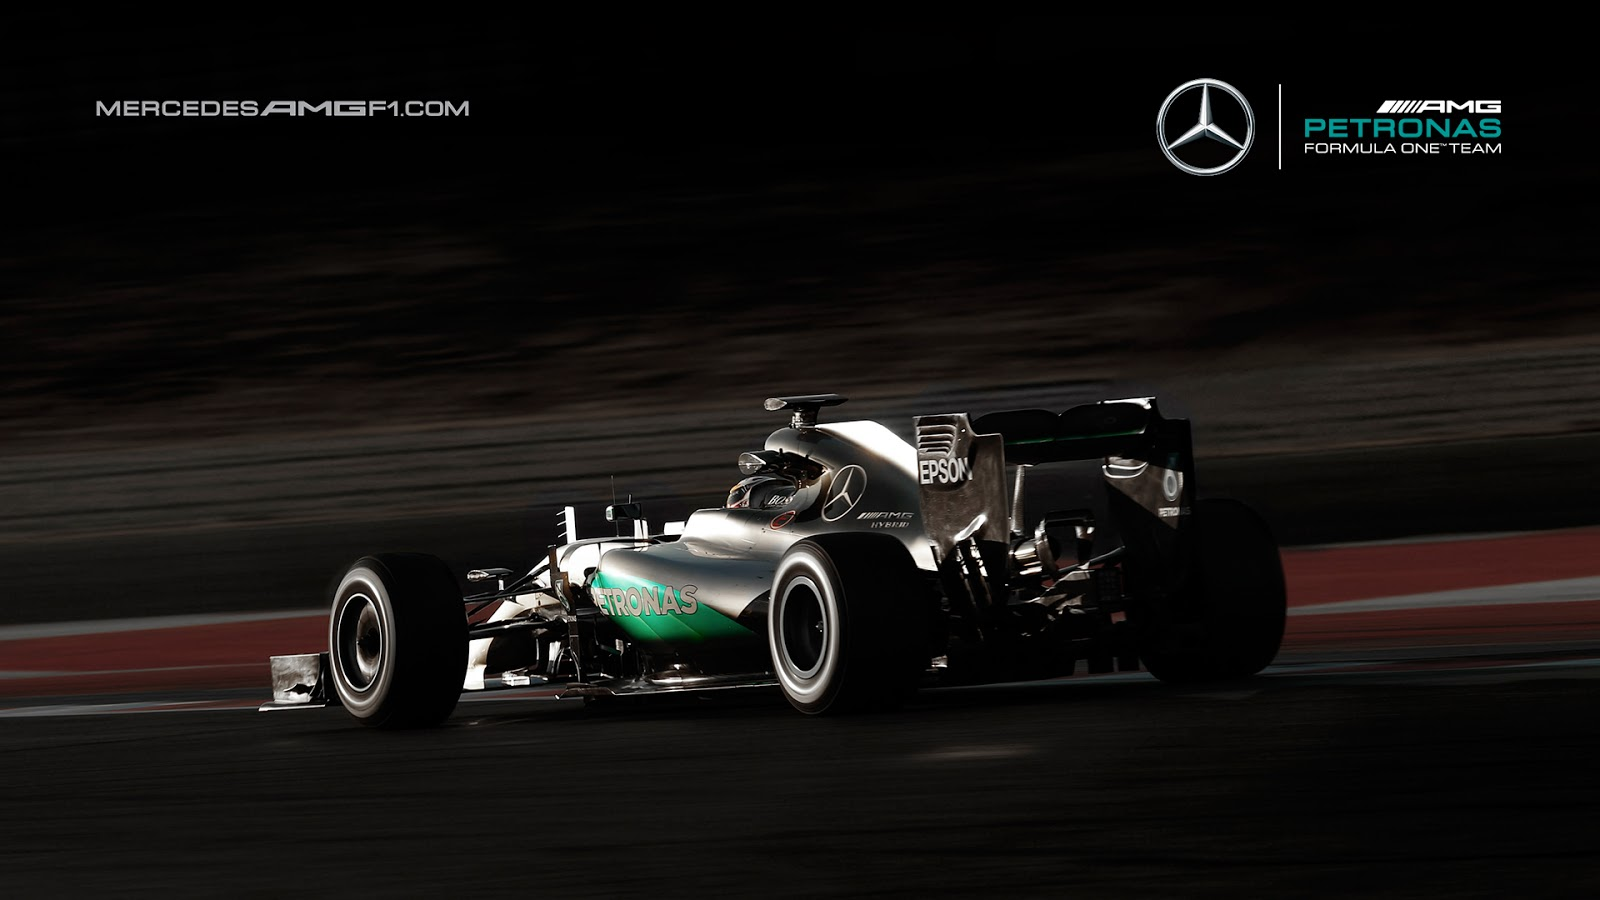 96+ Mercedes F1 Wallpapers on WallpaperSafari